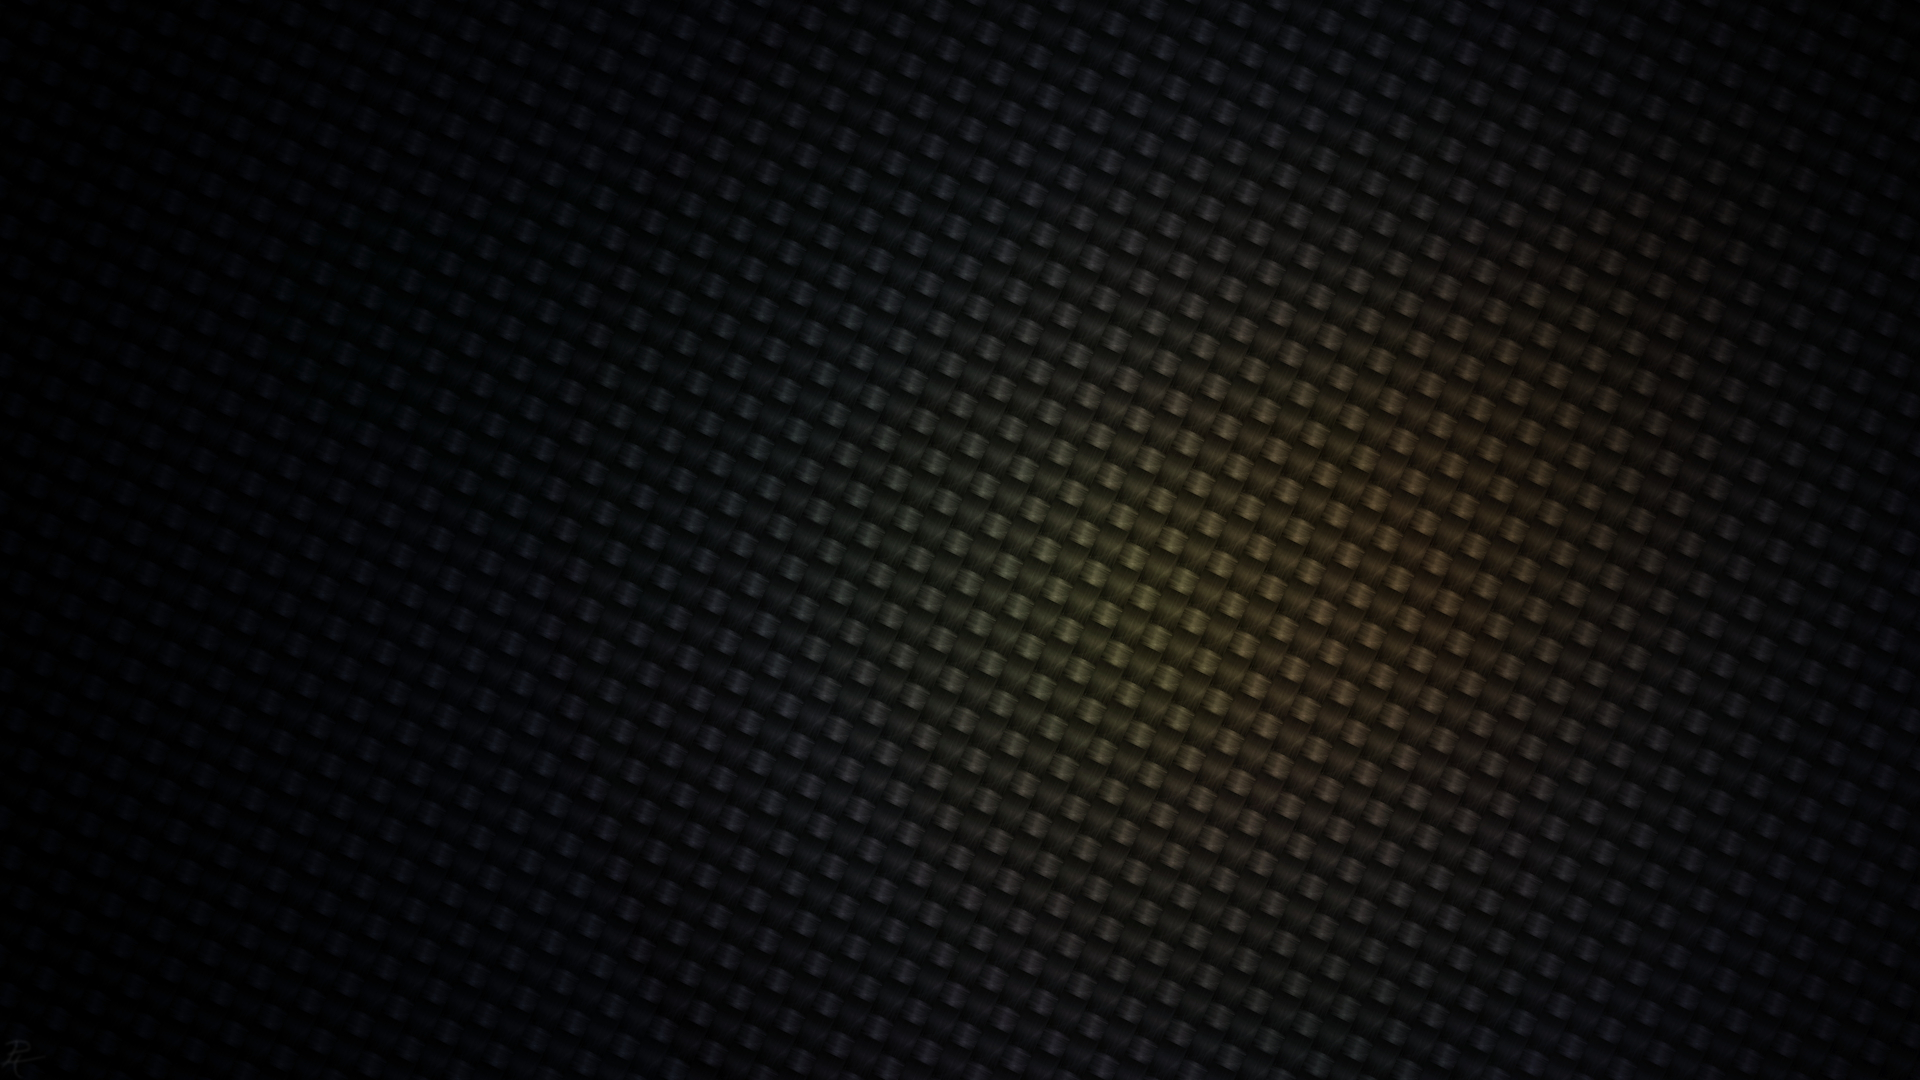 Carbon Fiber Background 22245 1920x1080 px fond ecran 1920x1080